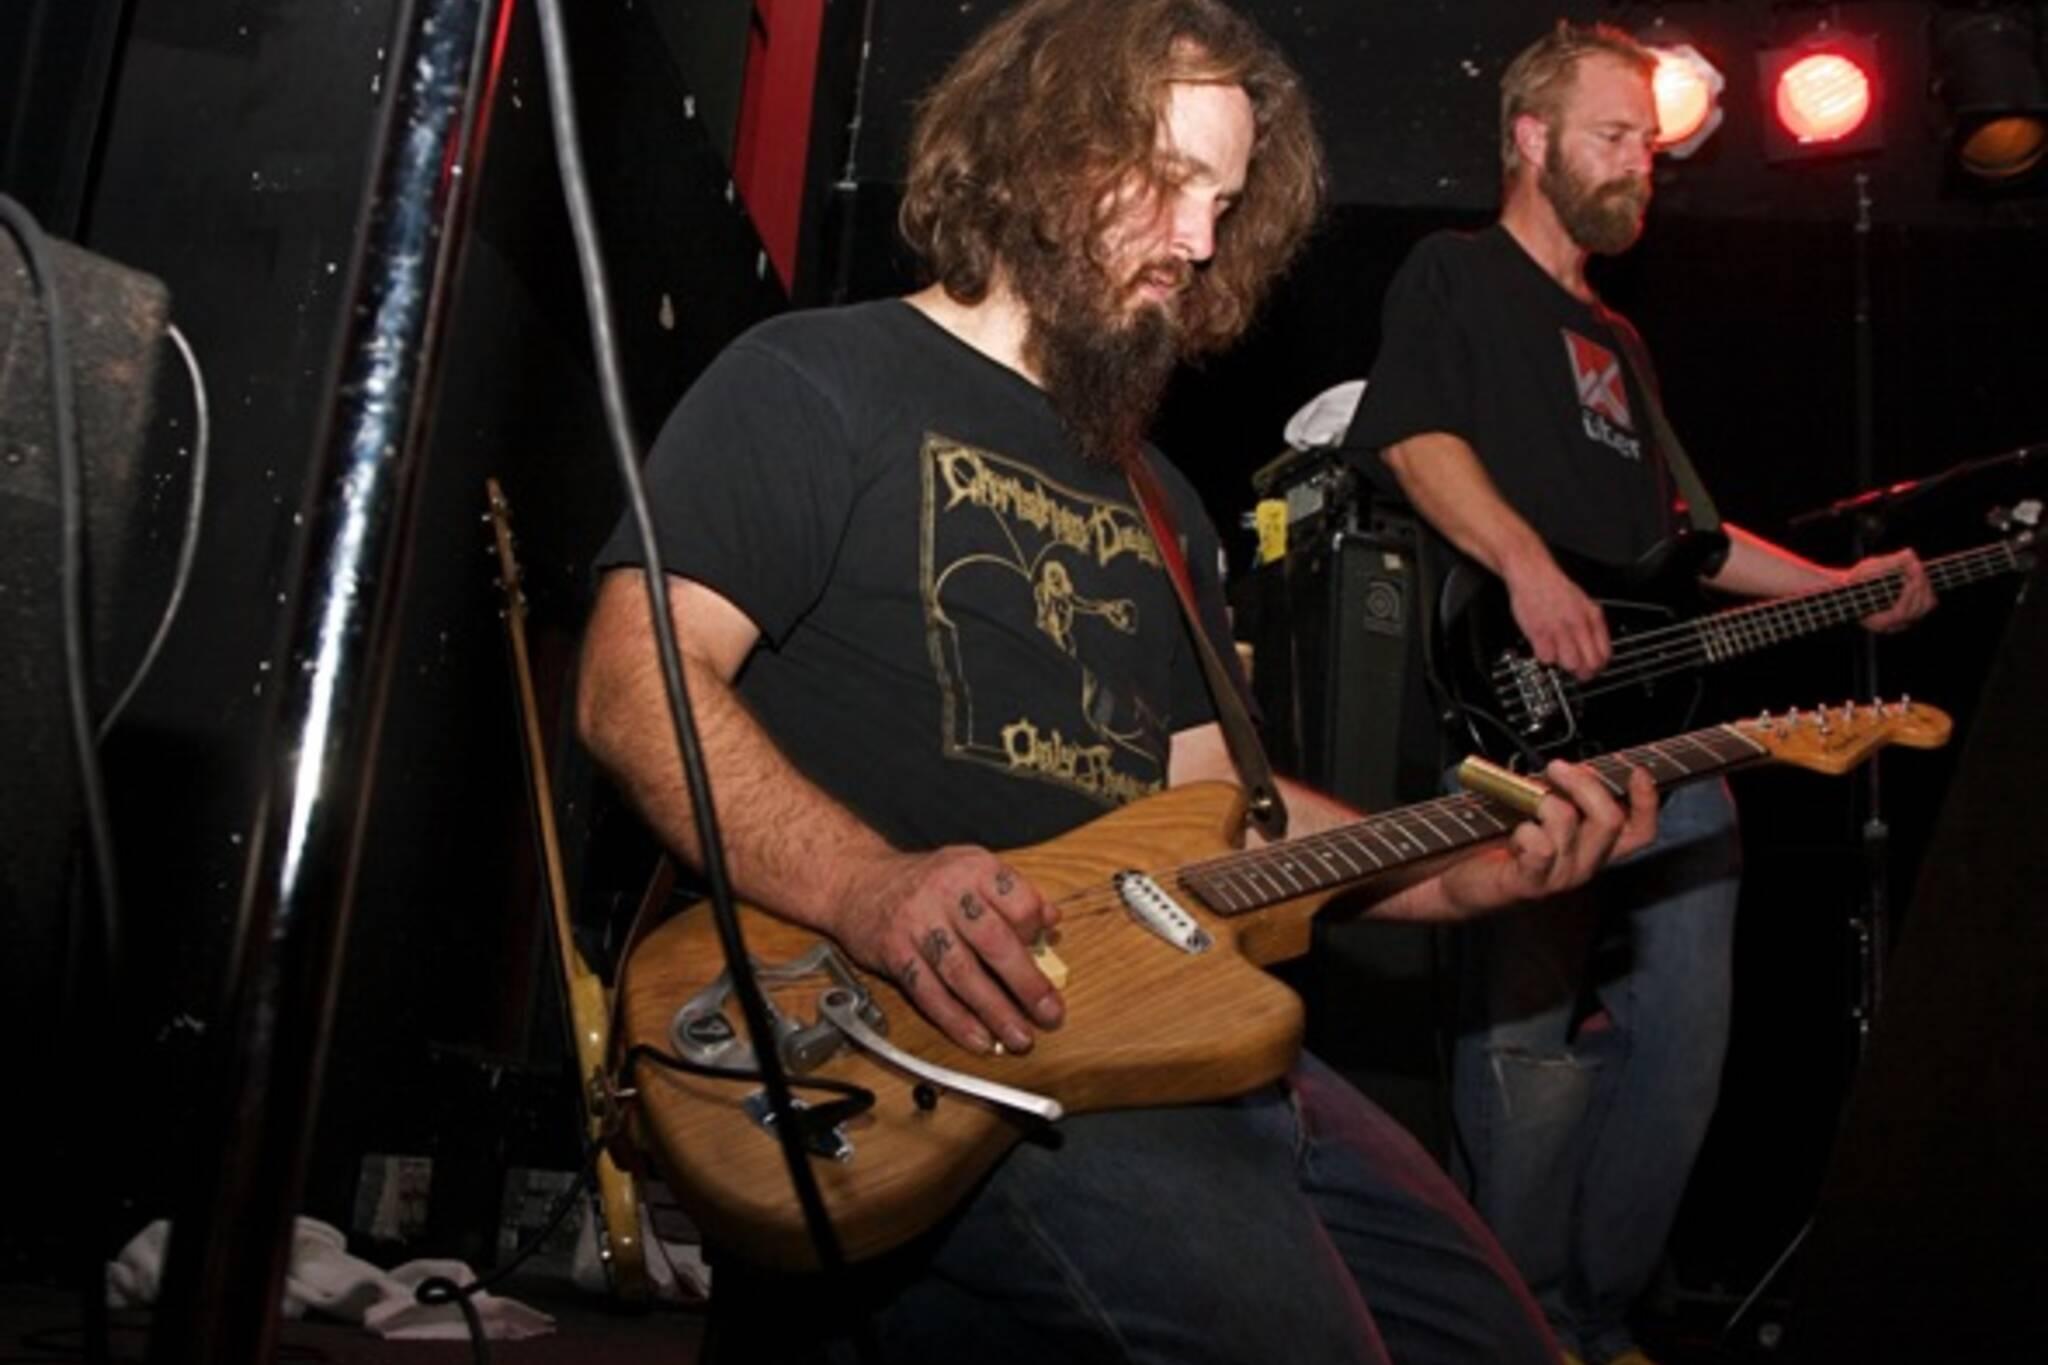 Built to Spill October 2009 tour